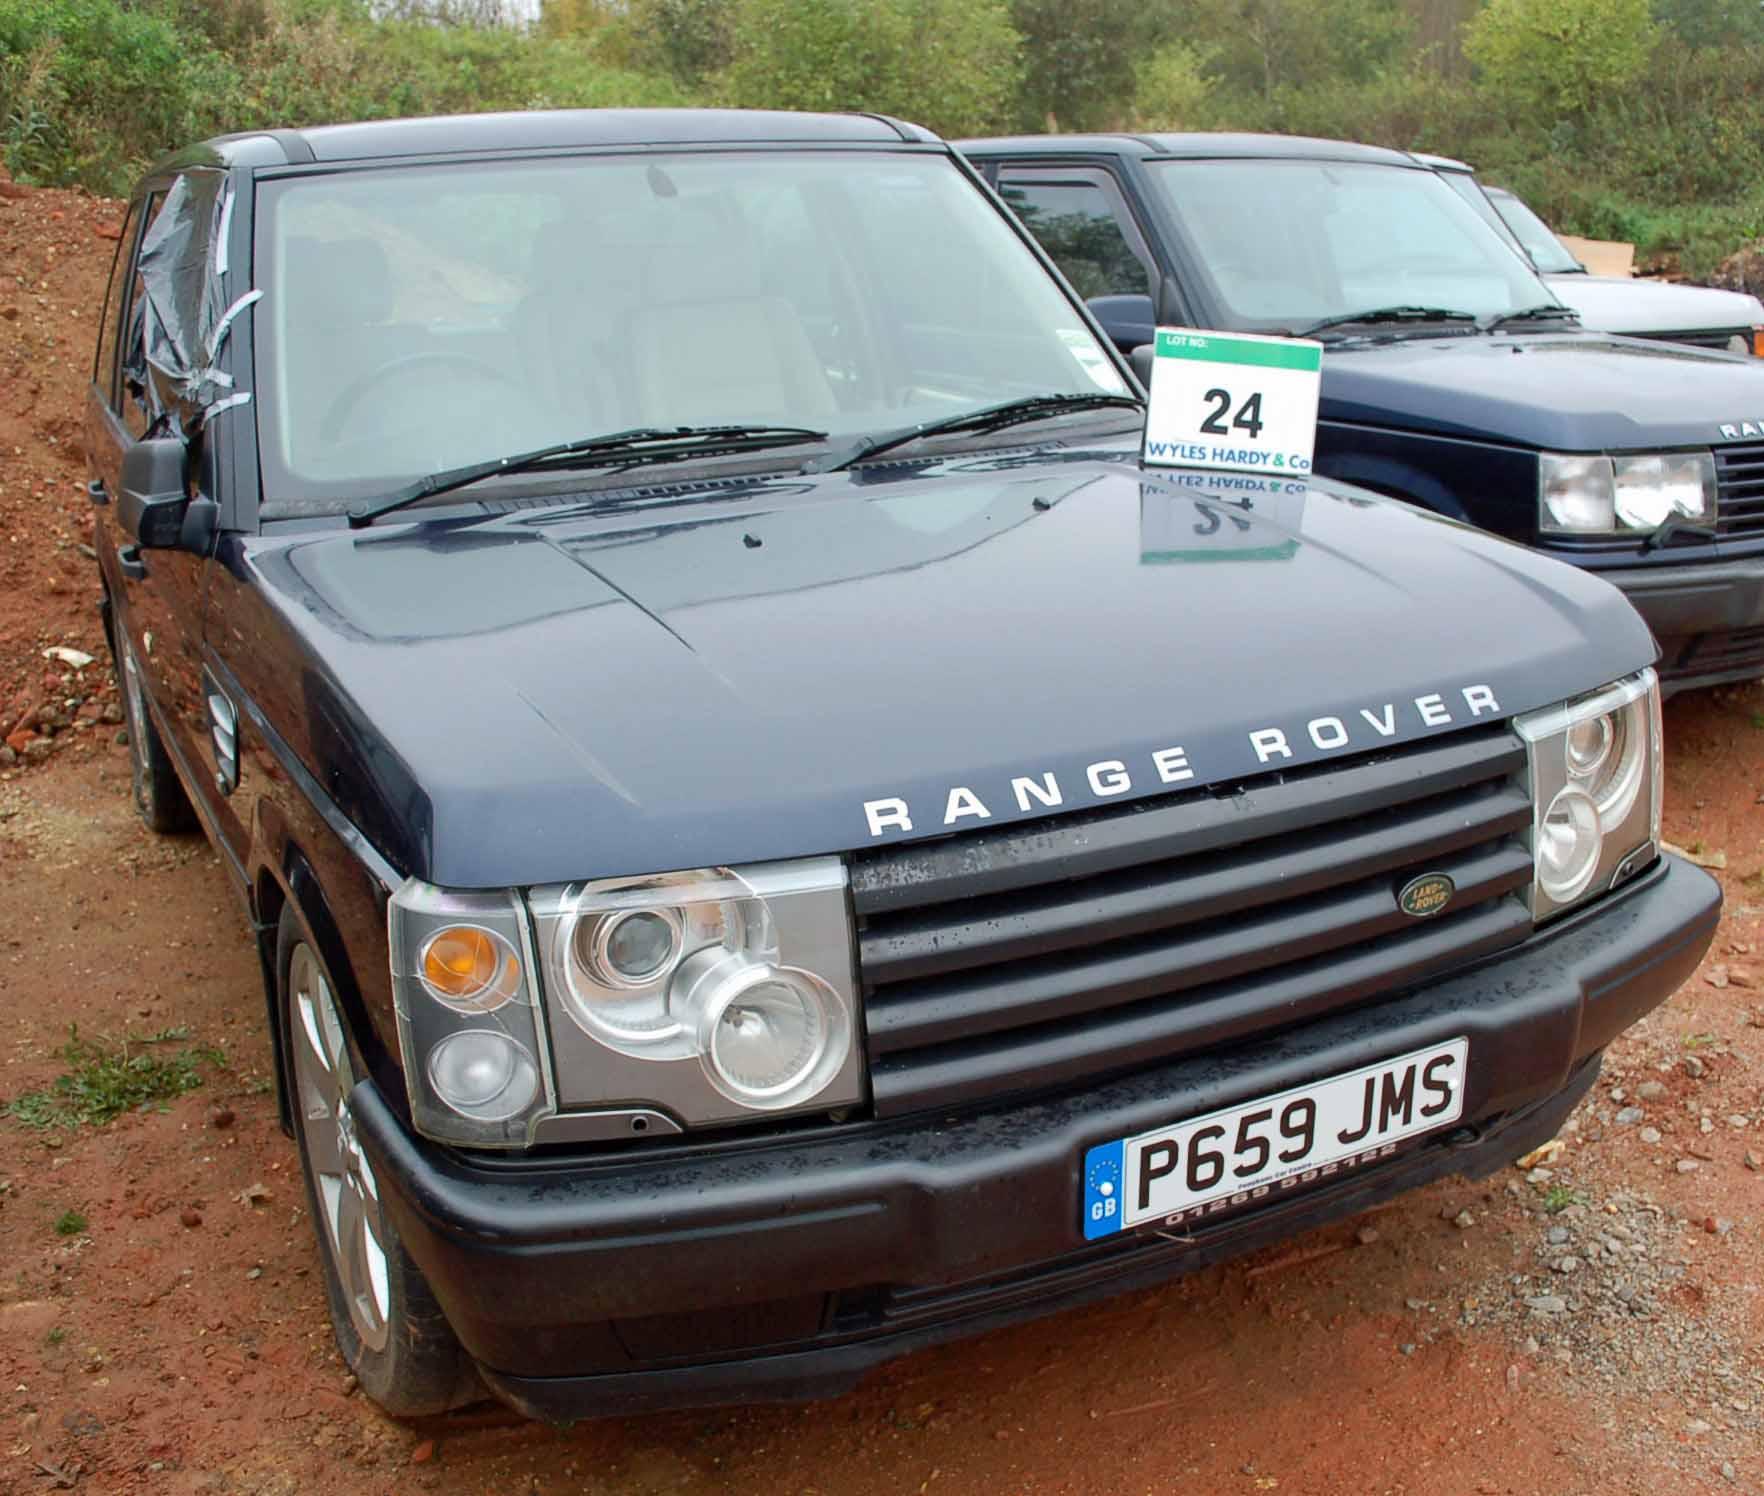 Lot 24 - A RANGE ROVER 4.0 SE 4x4 Auto, Registration No. P659 JMS, First Registered: 01/12/1996, Last